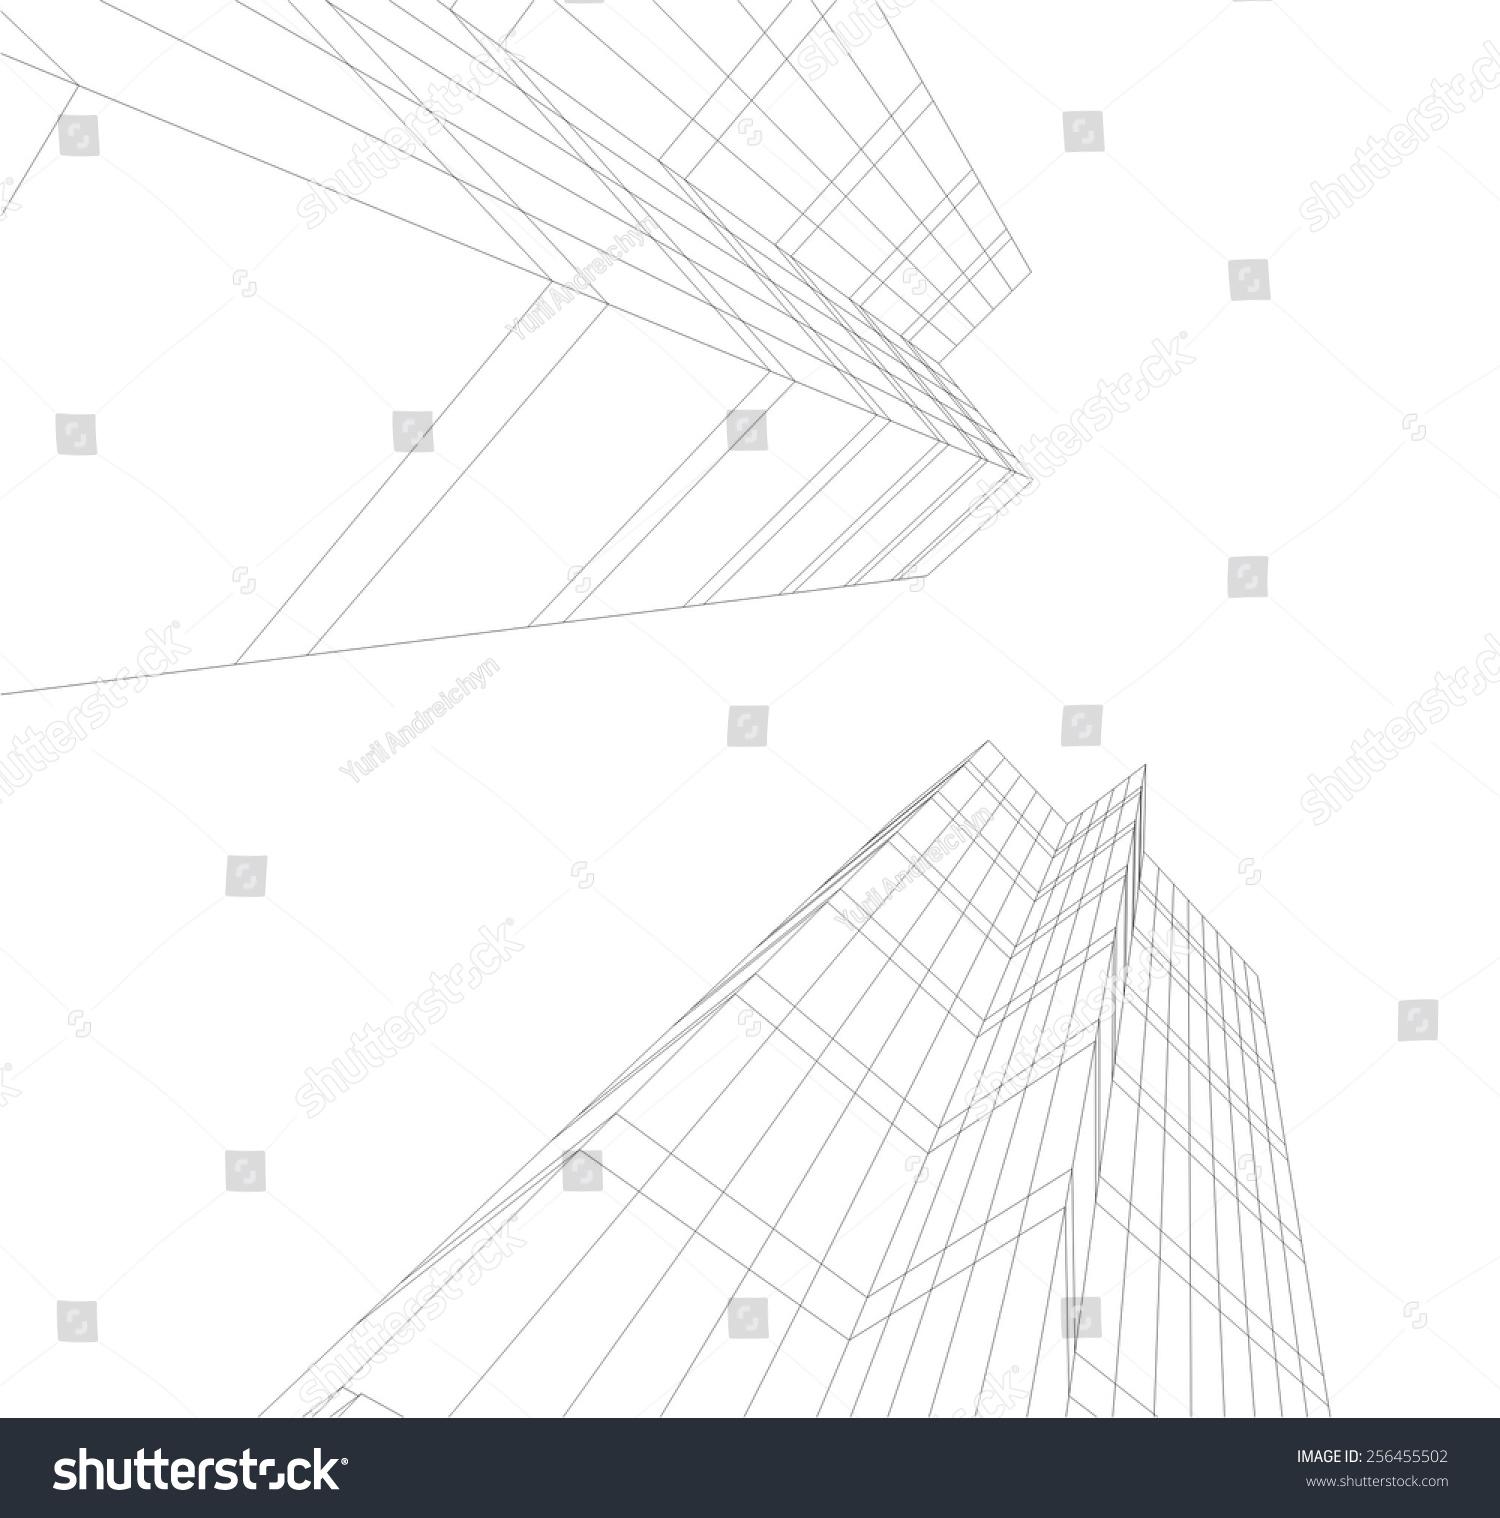 Modern Architectural Drawing Architecture Background Skyscraper